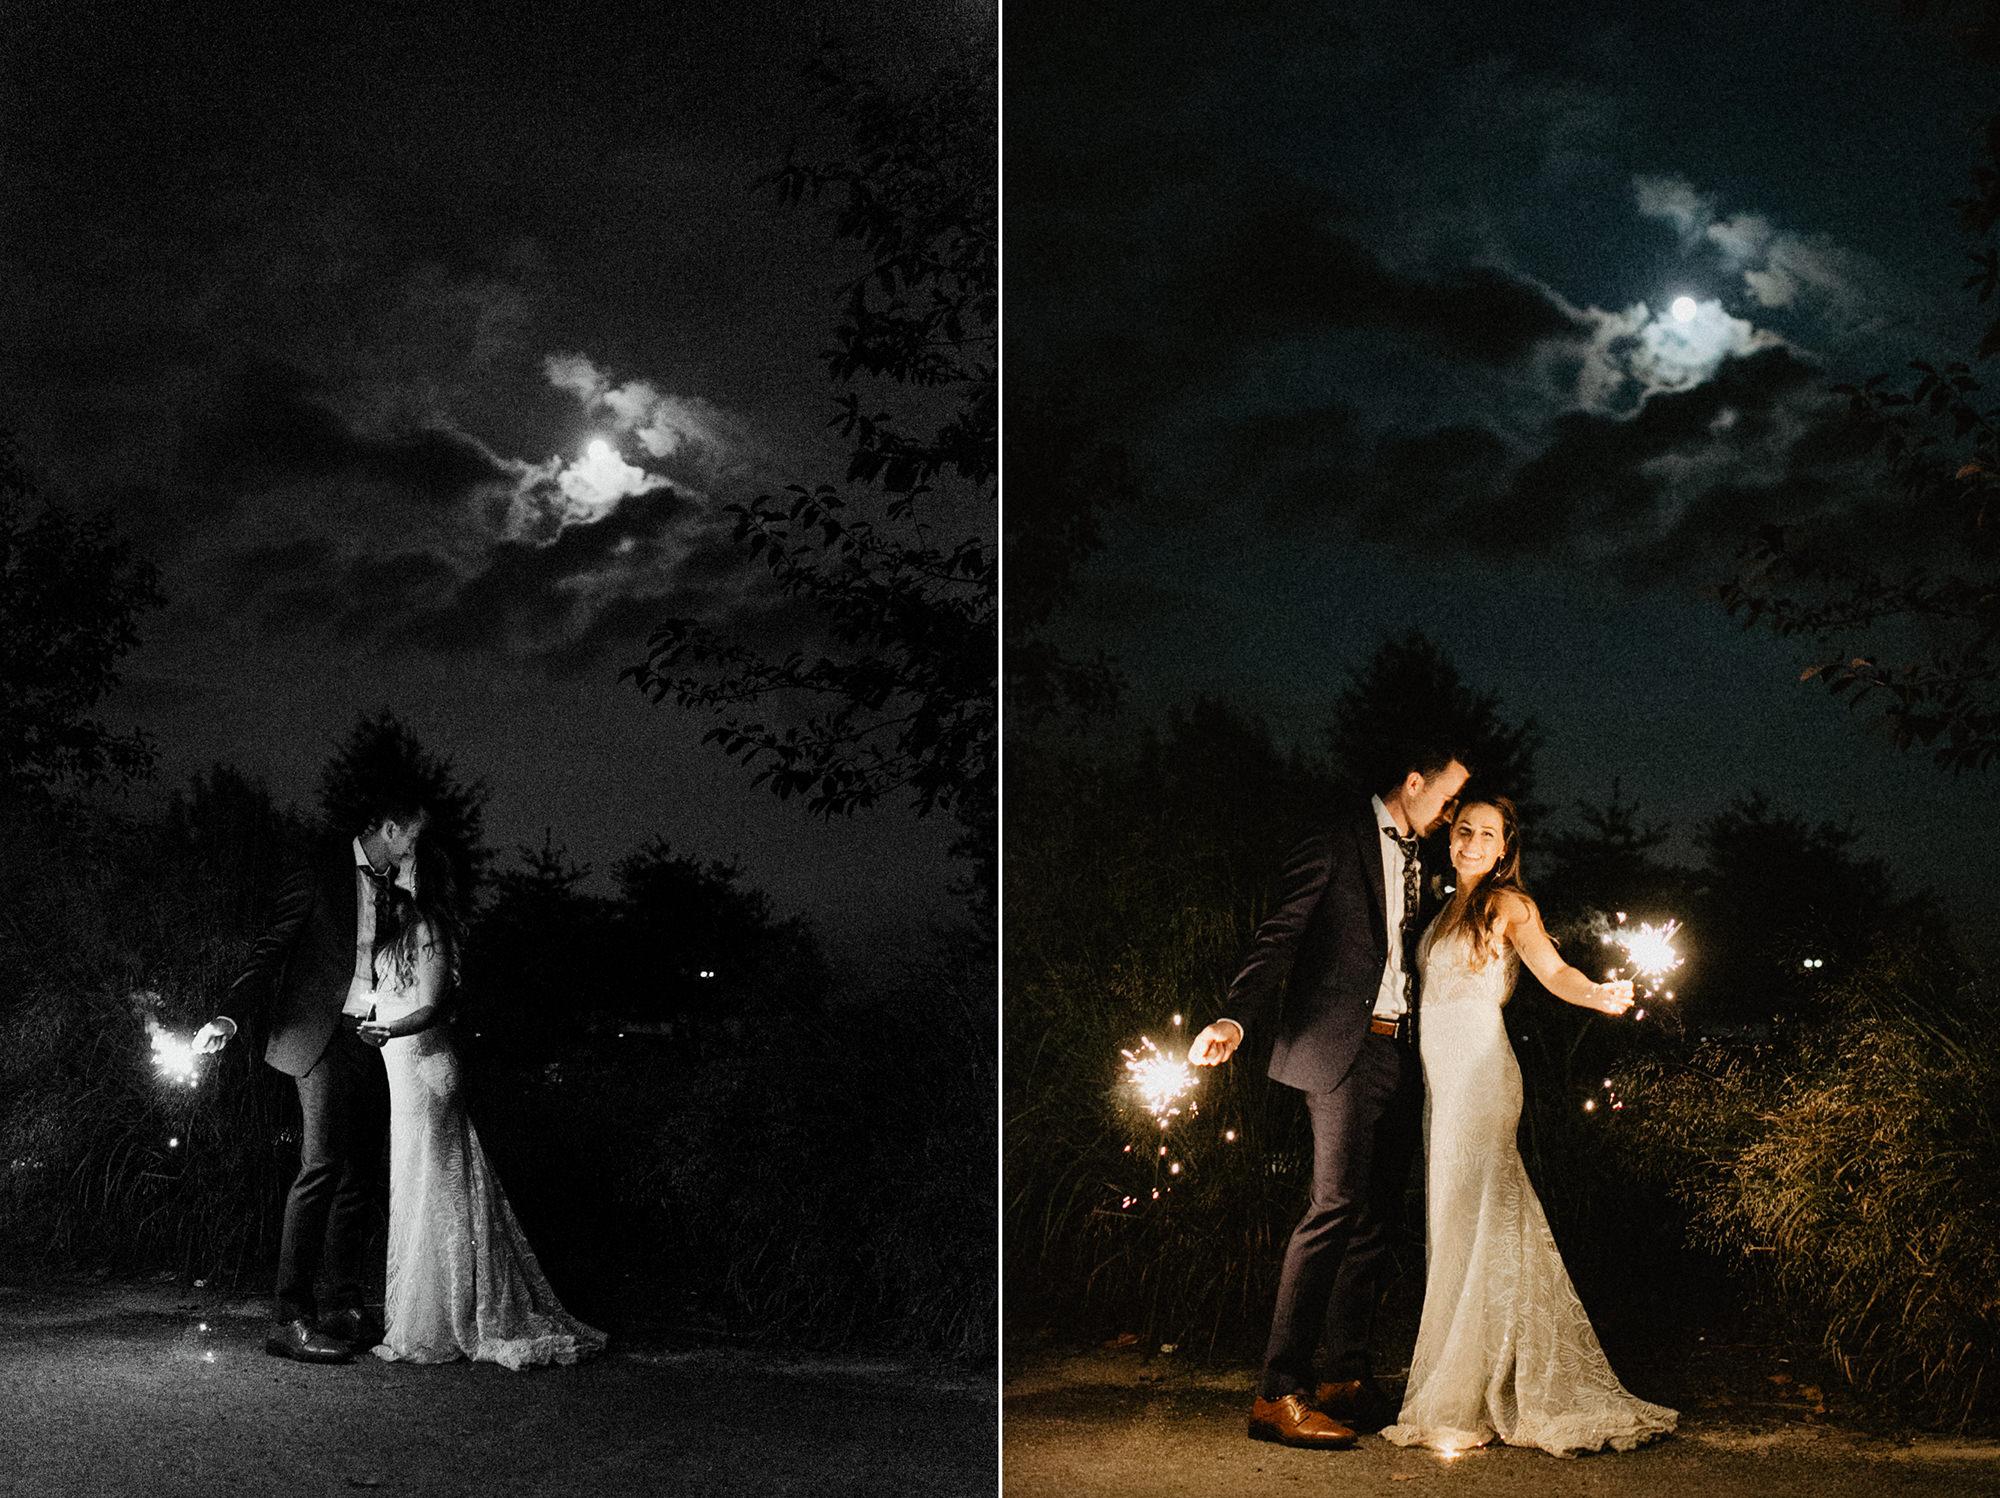 terrain-events-wedding-photographer-59.jpg